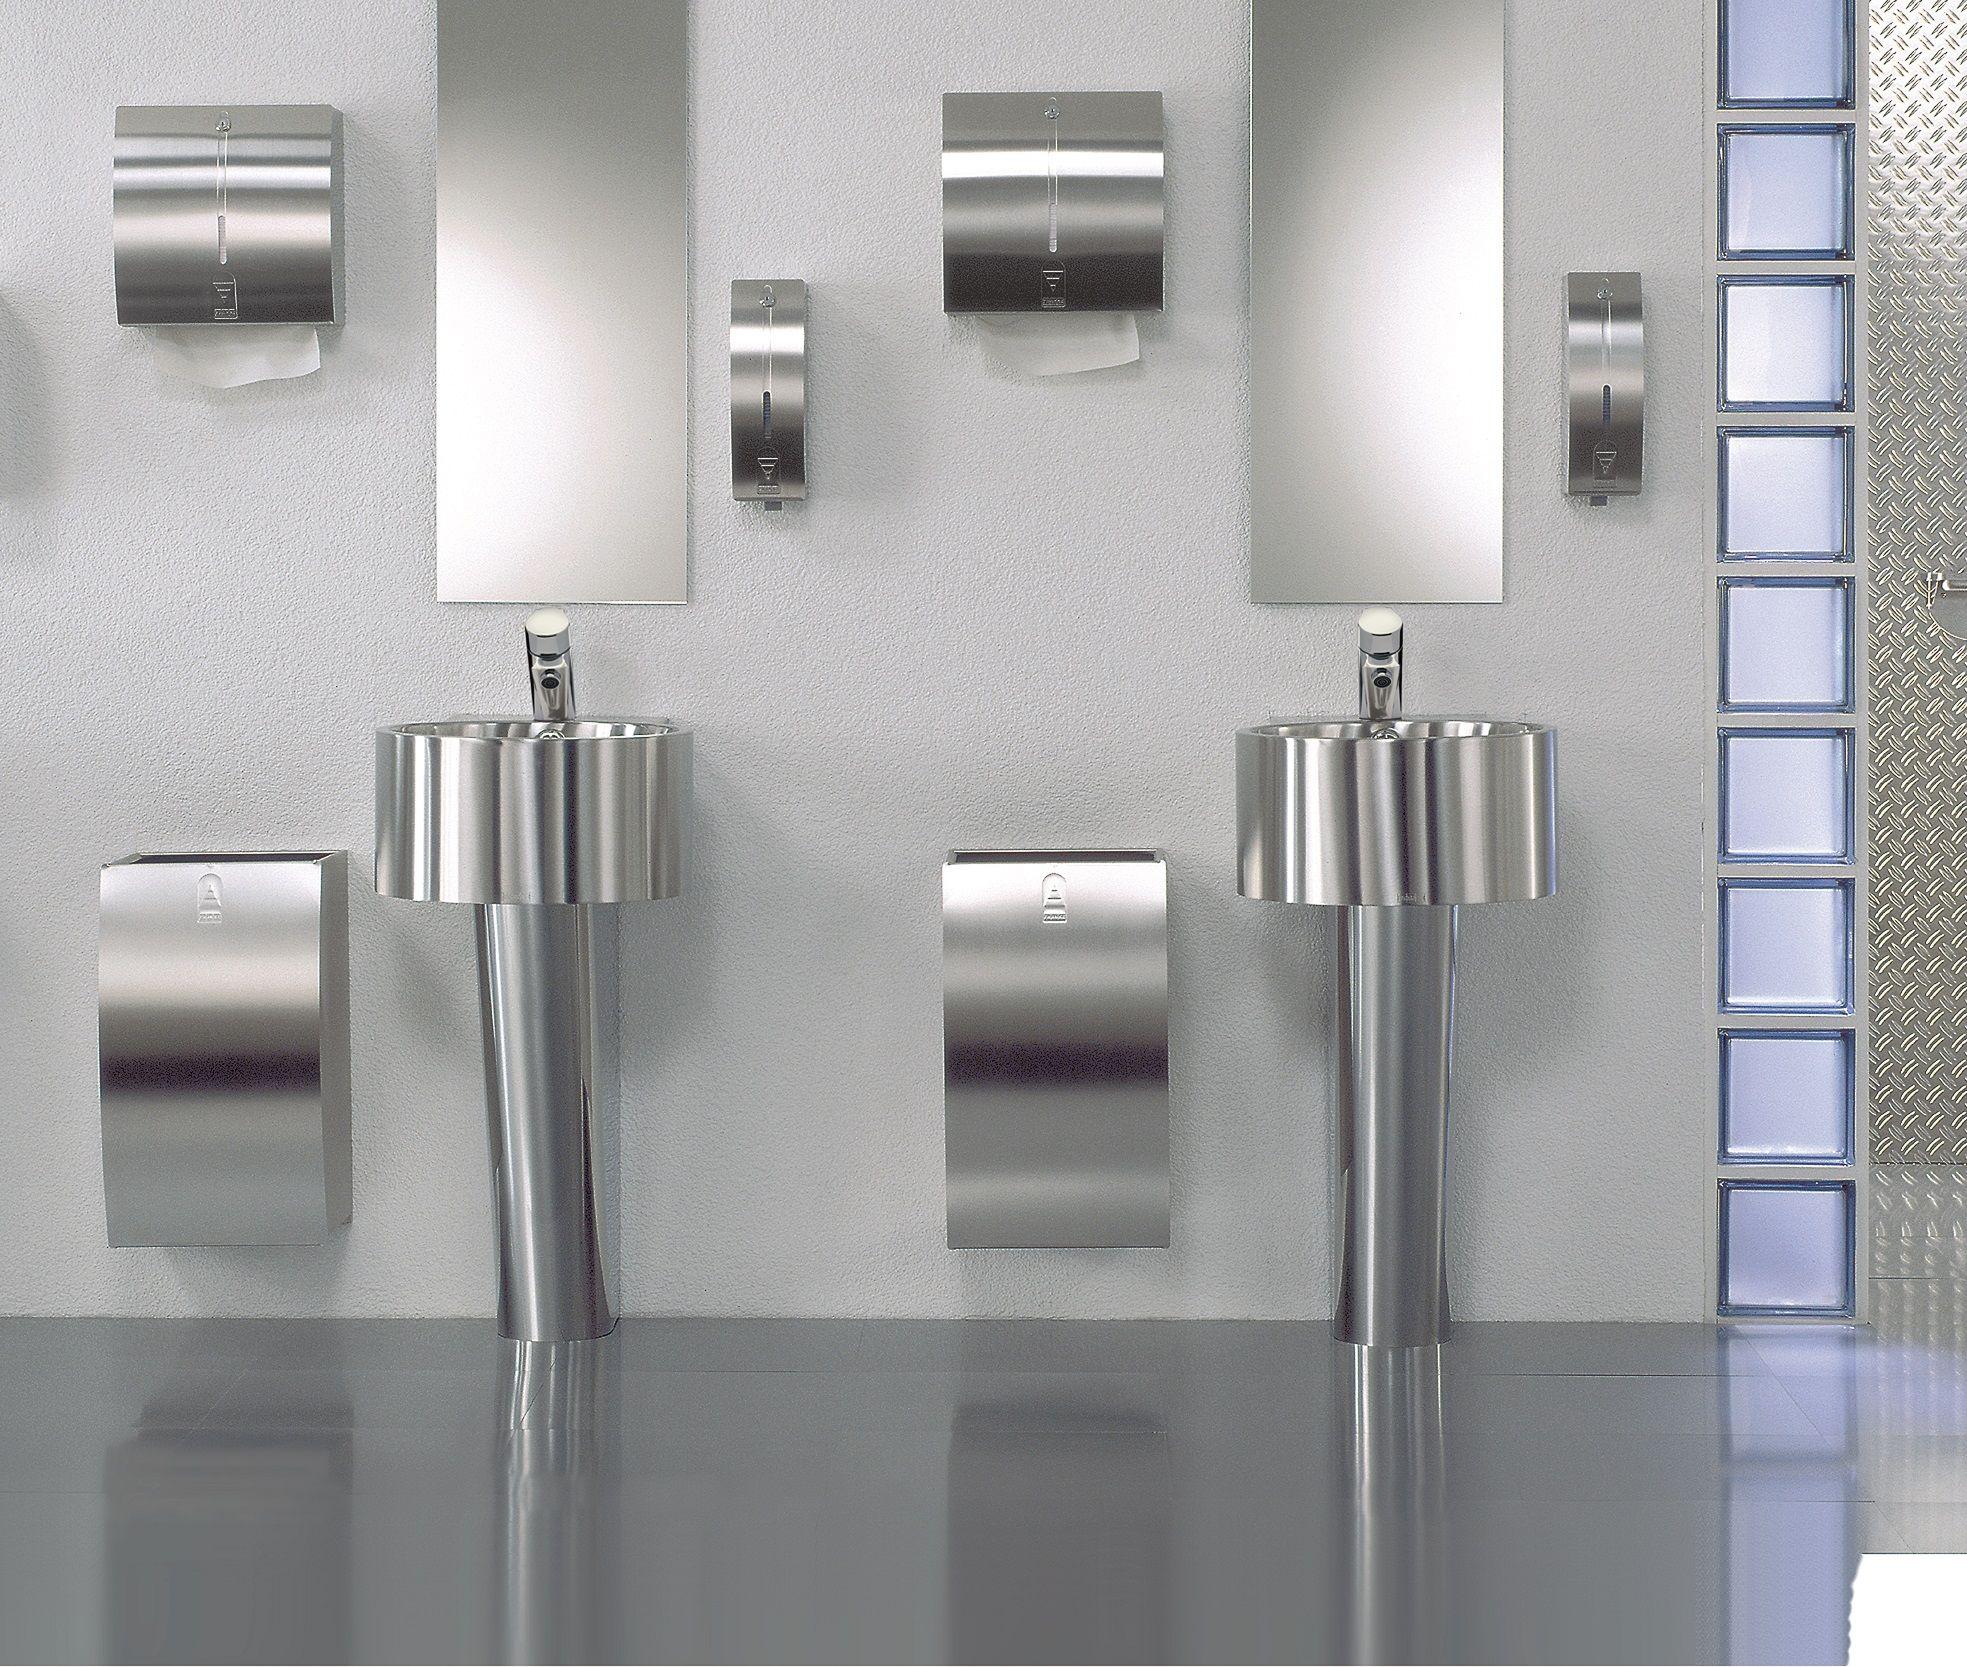 Franke Stratos Accessories Washroom Stainless Steel Bathroom Accessories Stainless Steel Bathroom Stainless Steel Accessories